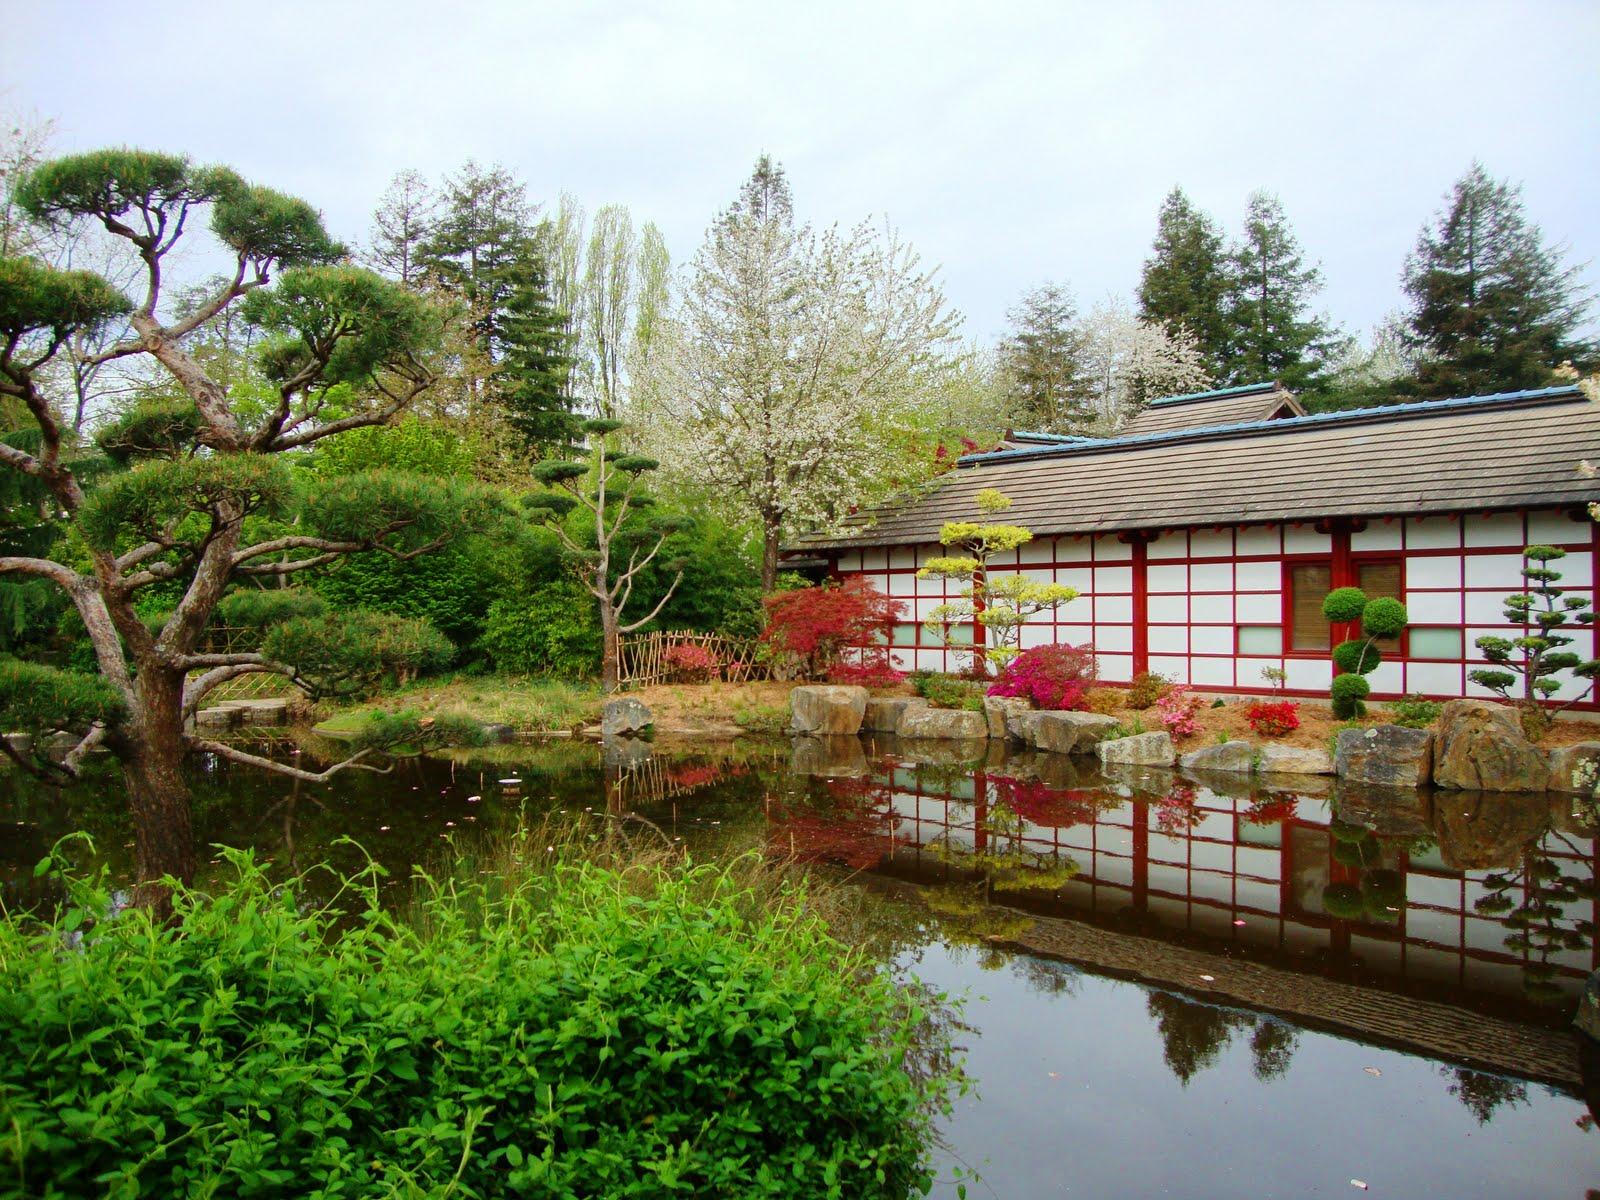 Nantes eine viertelseite im reisef hrer renard teipelke for Jardin japonais nantes